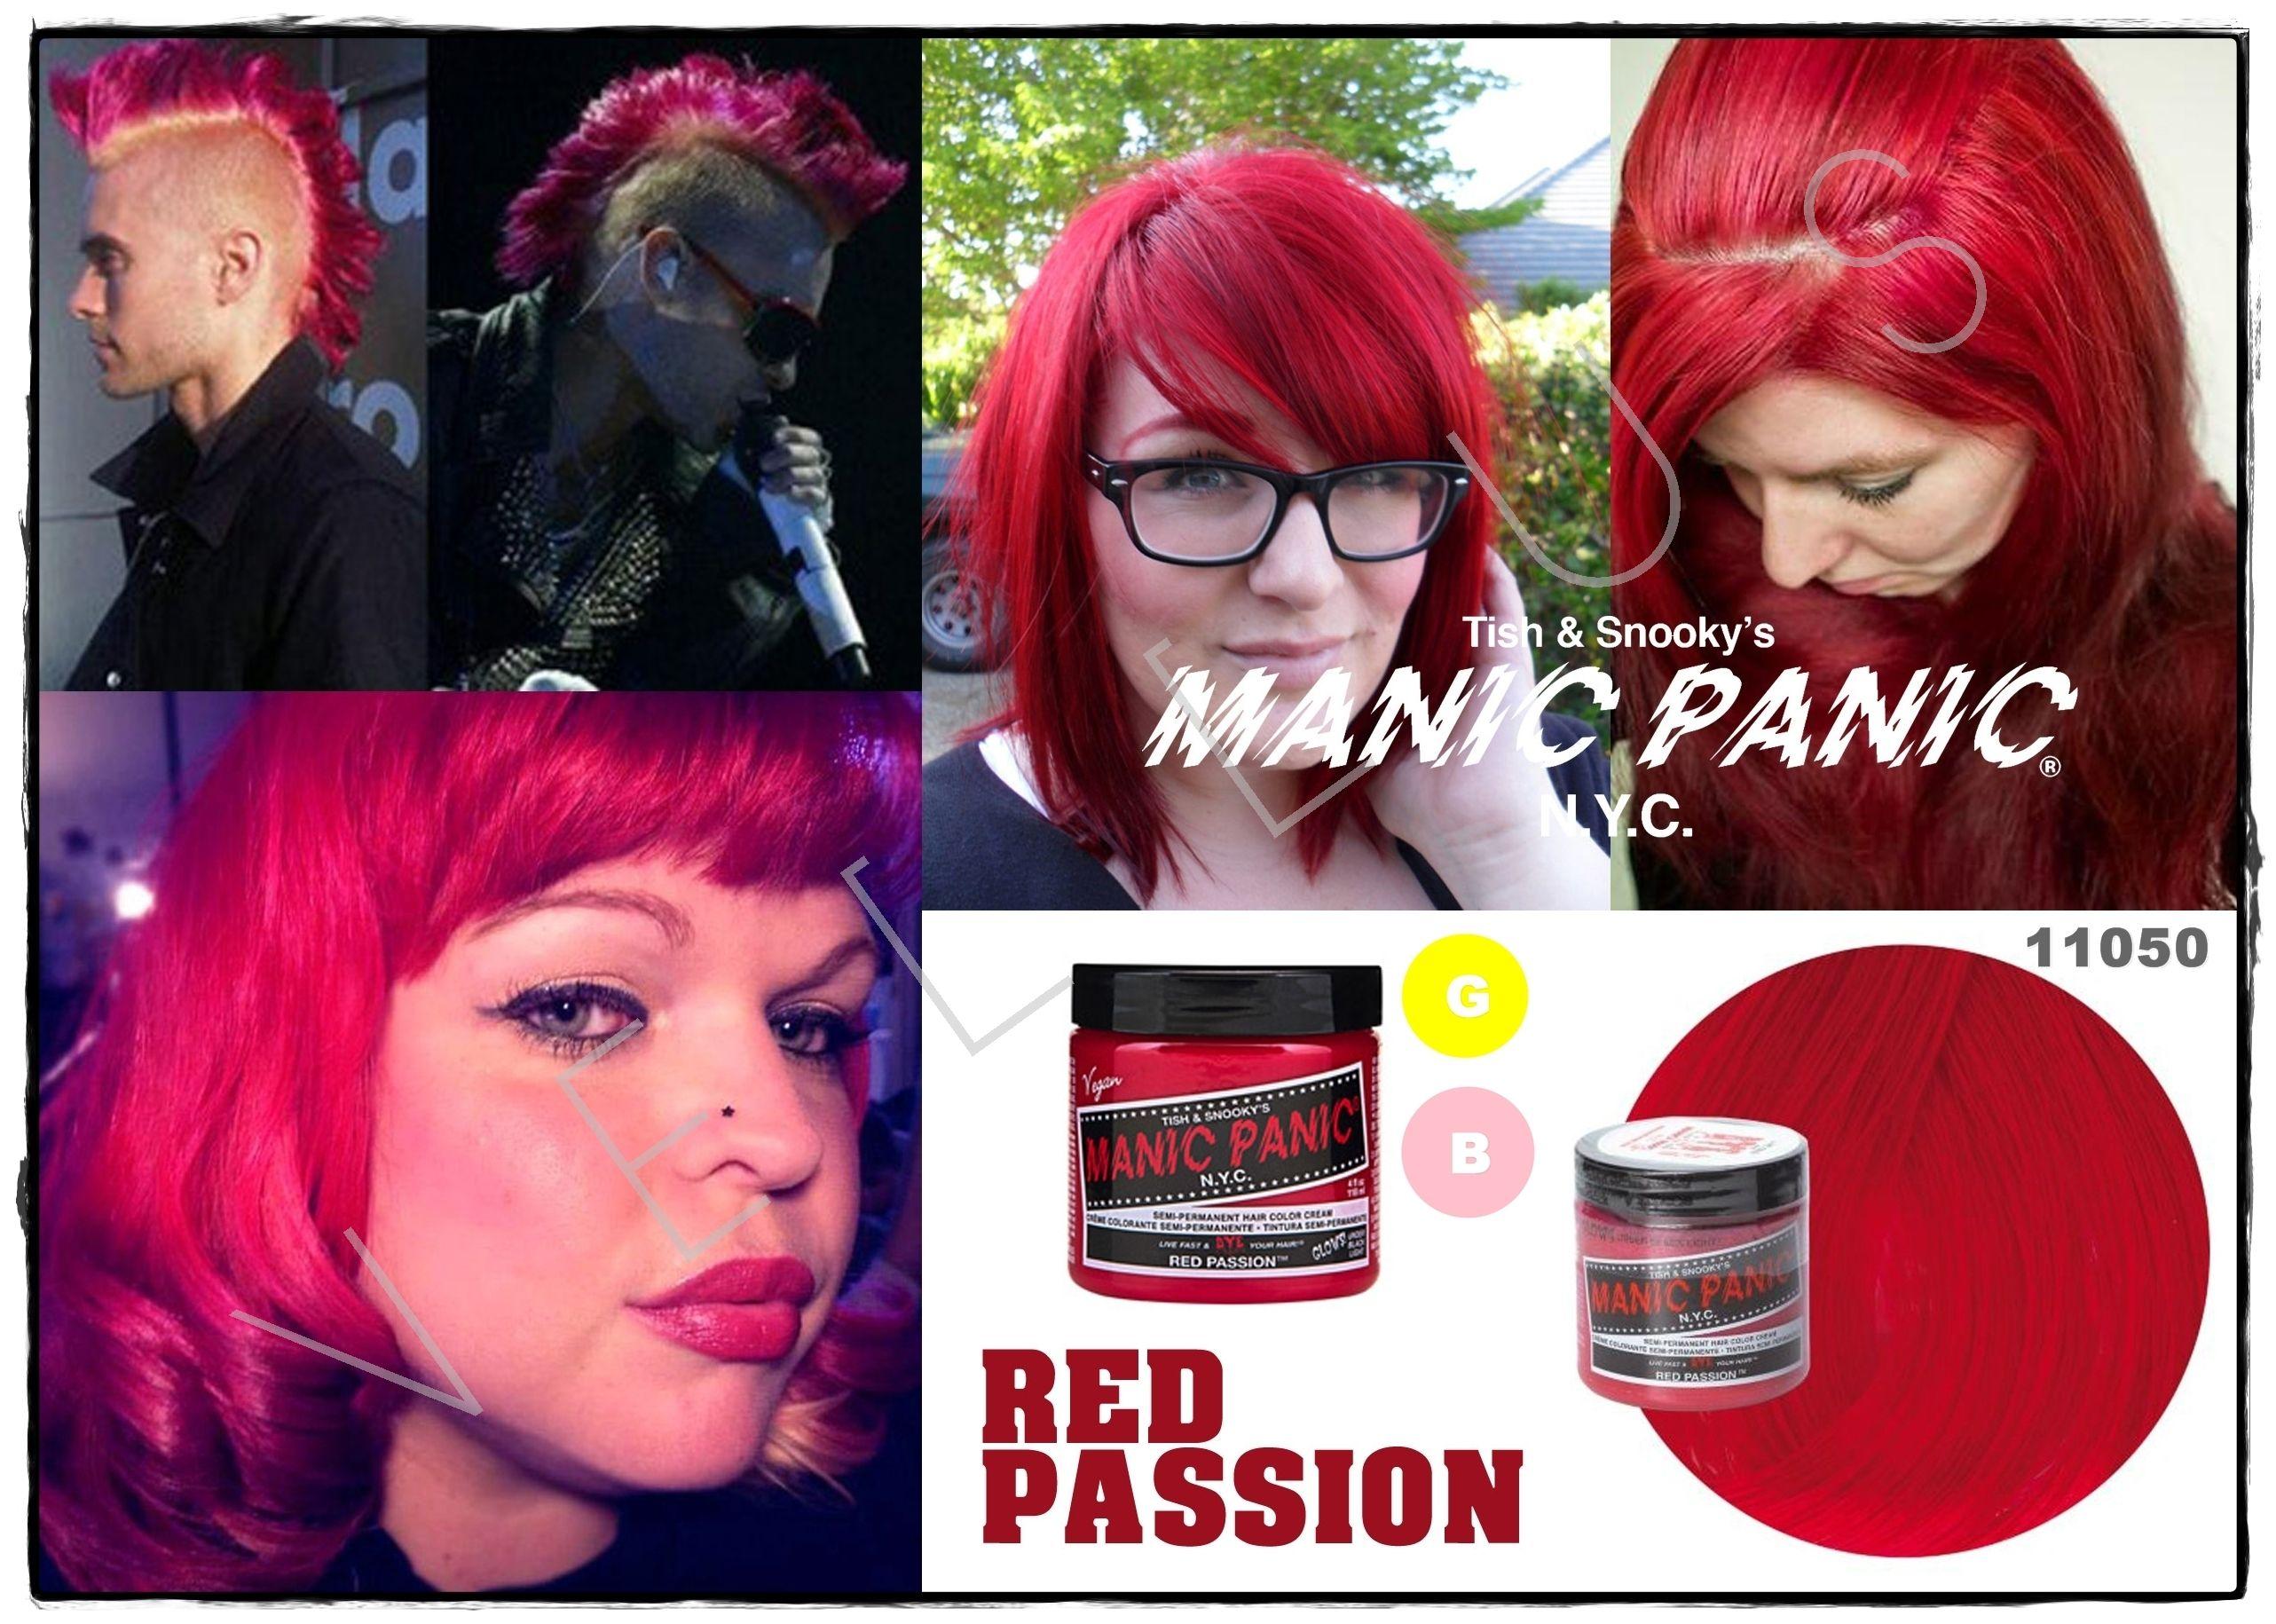 Manic Panic Classic Red Passion Vellus Hair Studio 83a Tanjong Pagar Road S 088504 Tel 62246566 Hair Studio Vellus Hair Hair Color